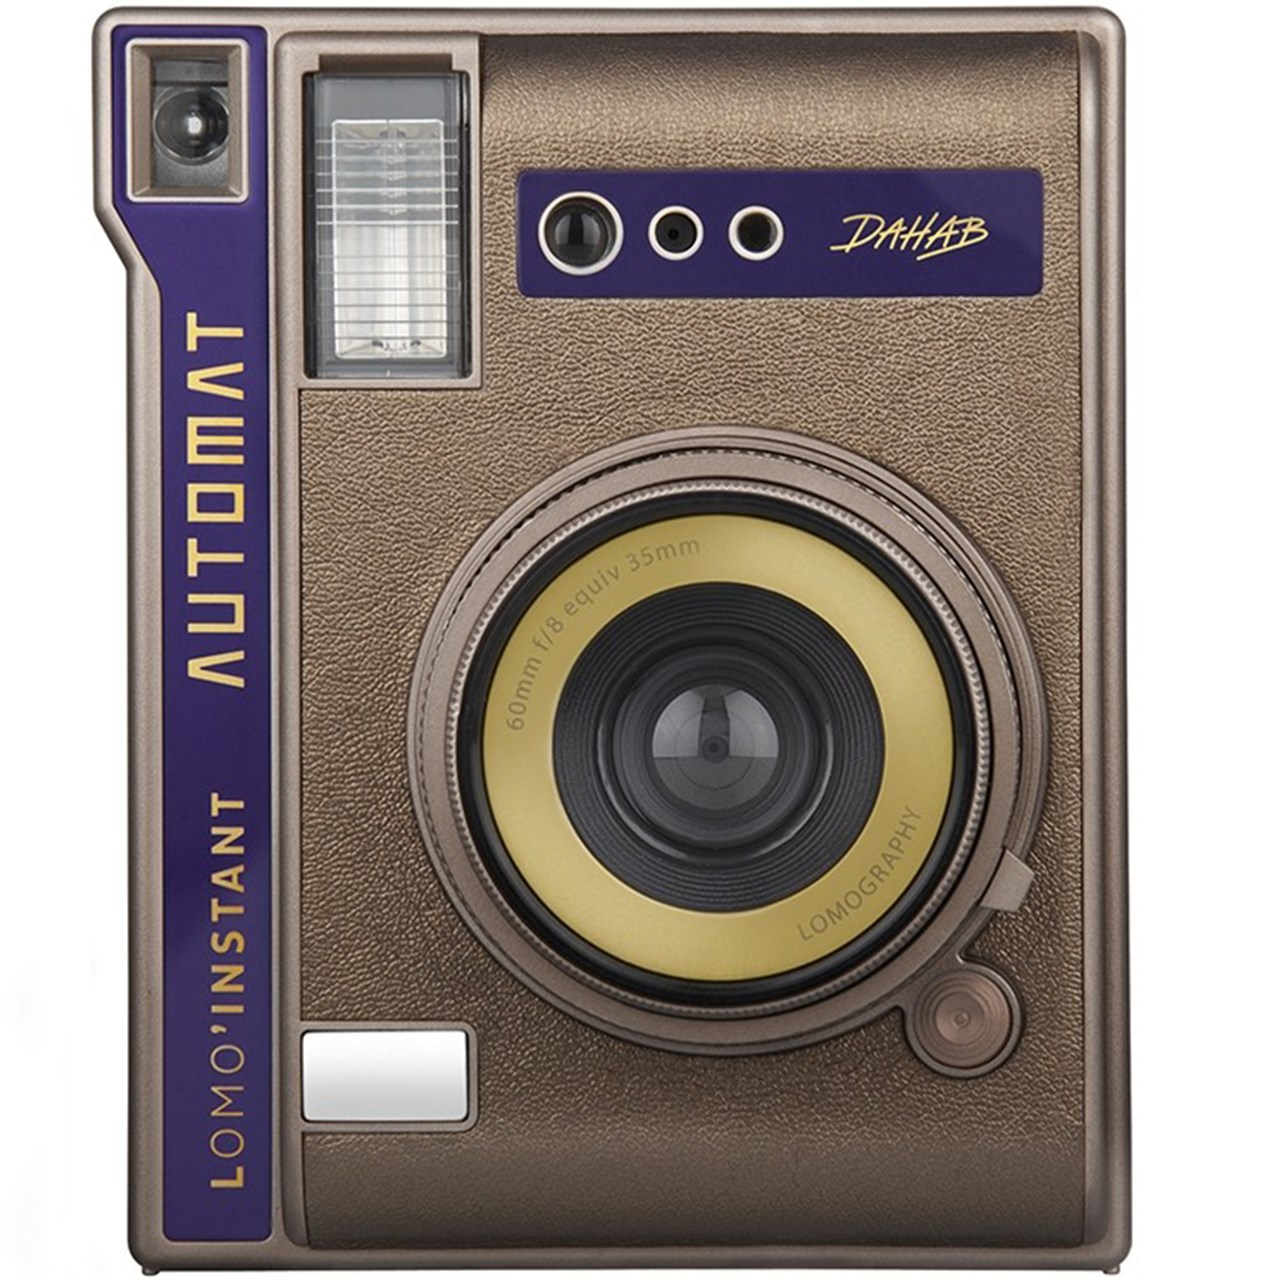 فروش نقدی و اقساطی دوربین چاپ سریع لوموگرافی مدل Automat Dahab